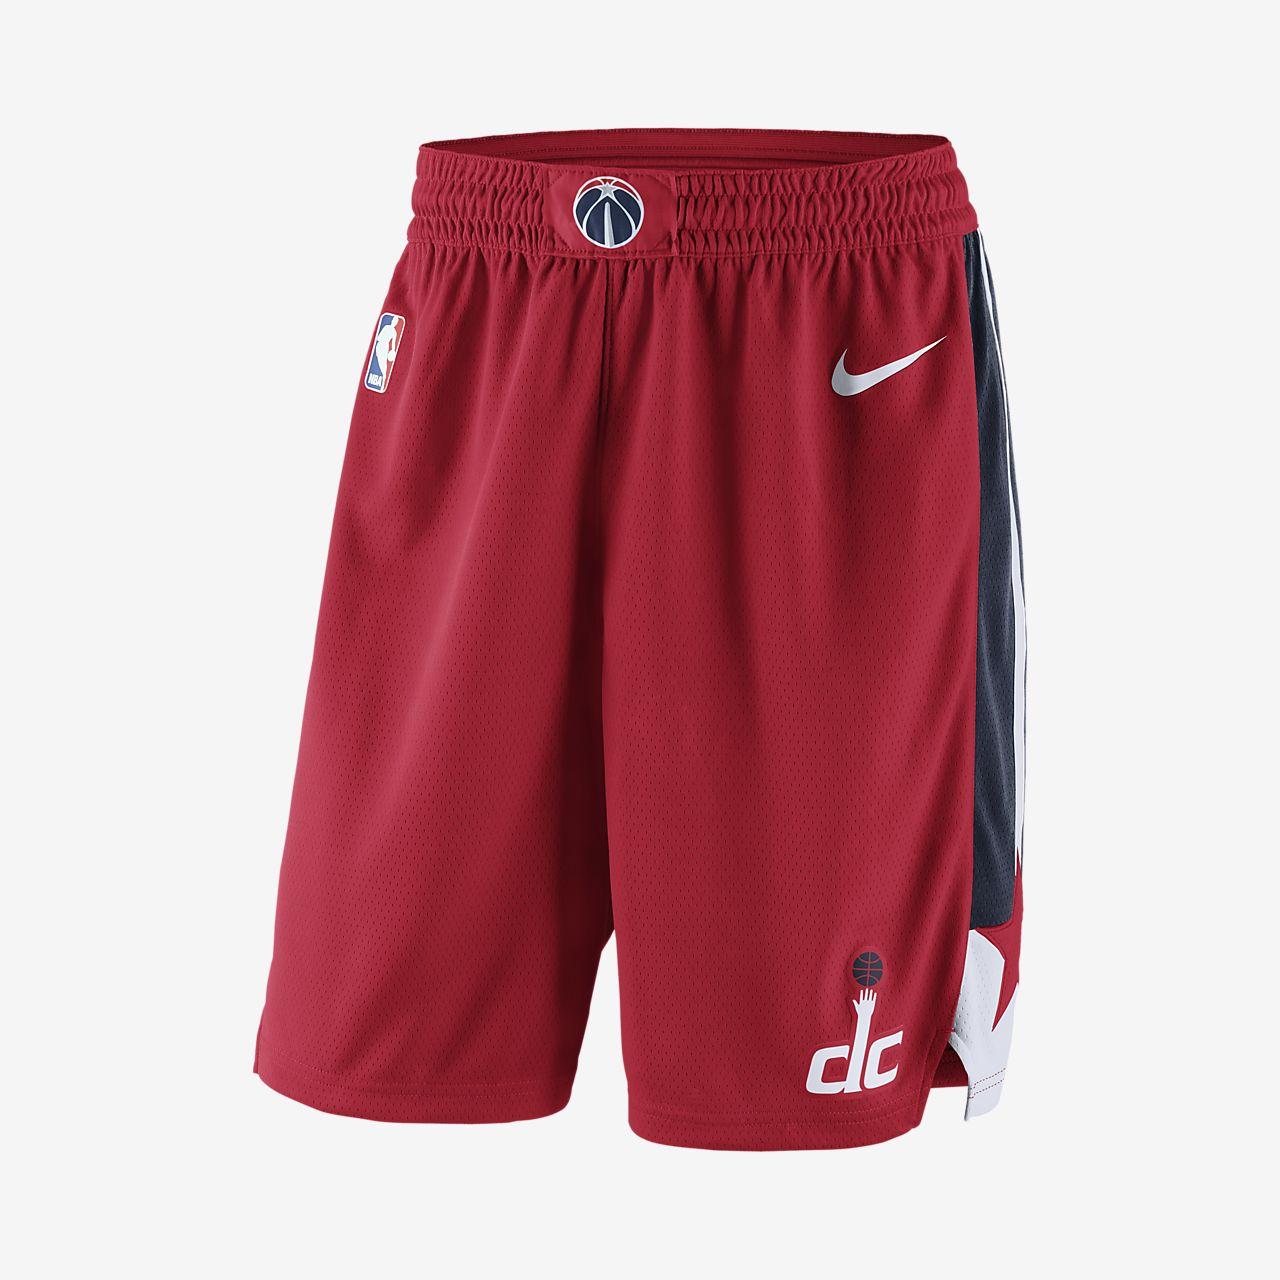 4c791ae5e Washington Wizards Nike Icon Edition Swingman Men s NBA Shorts. Nike ...